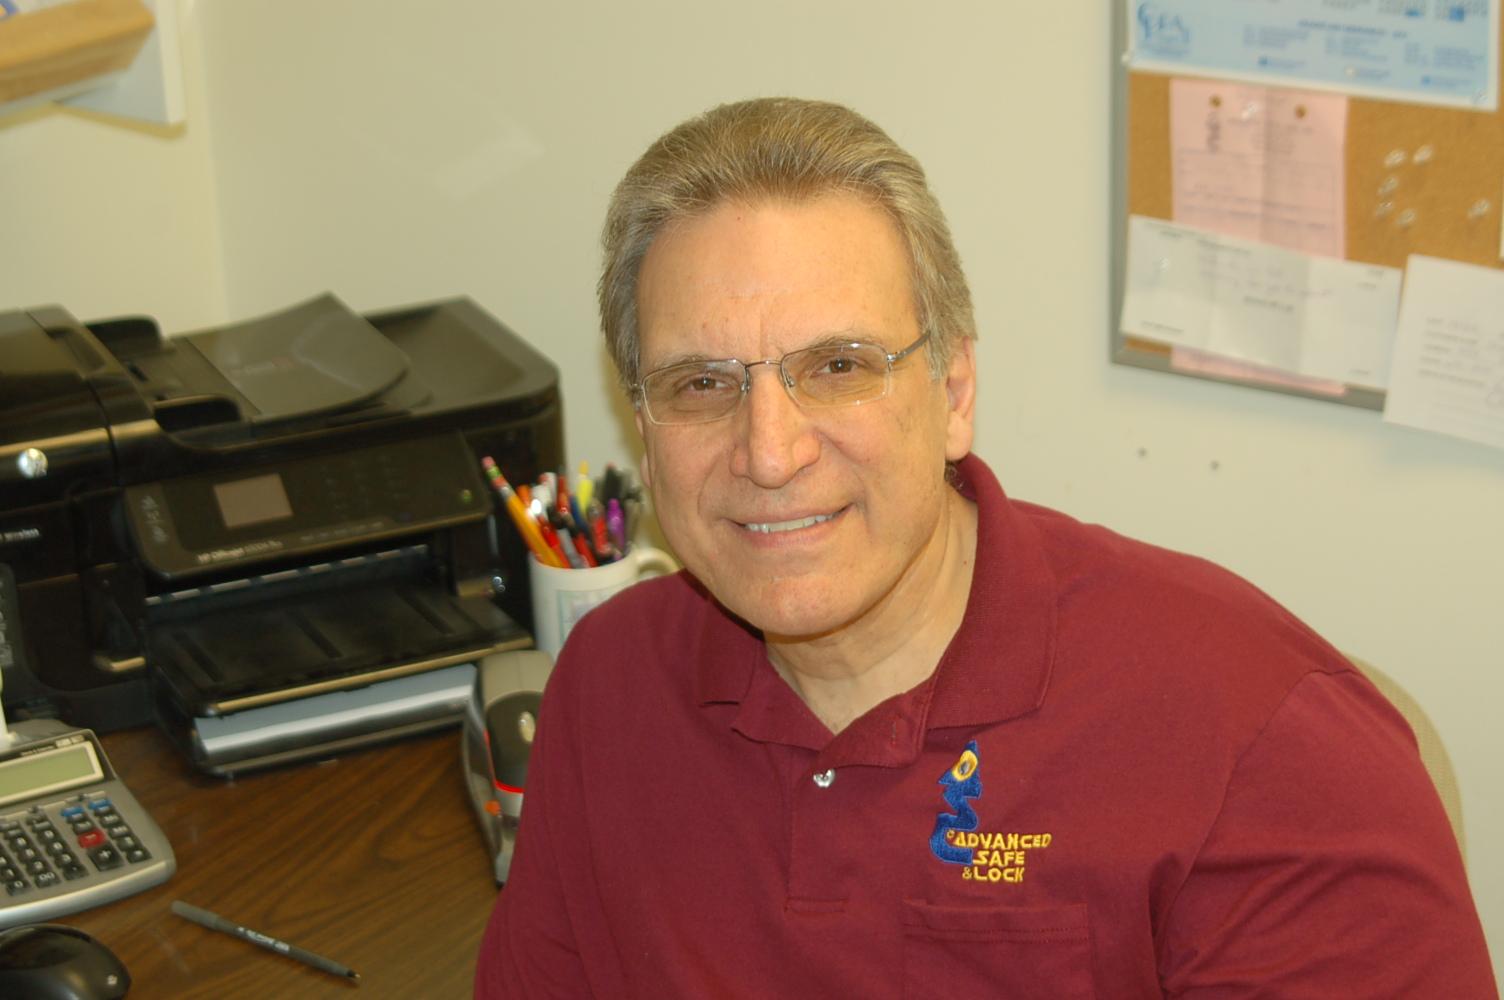 John Mastrella, Director of Operations and Communications